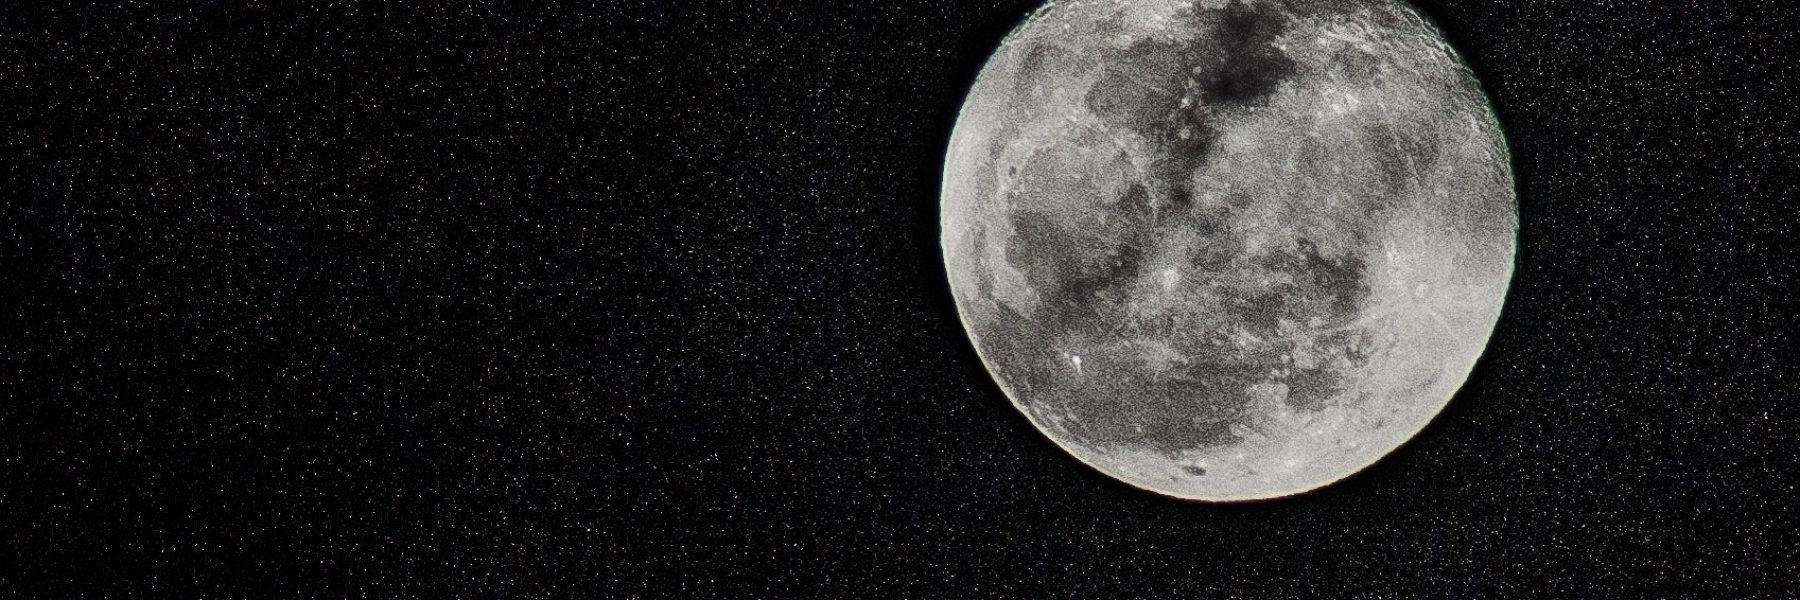 Moon_And_Stars_(64165819)